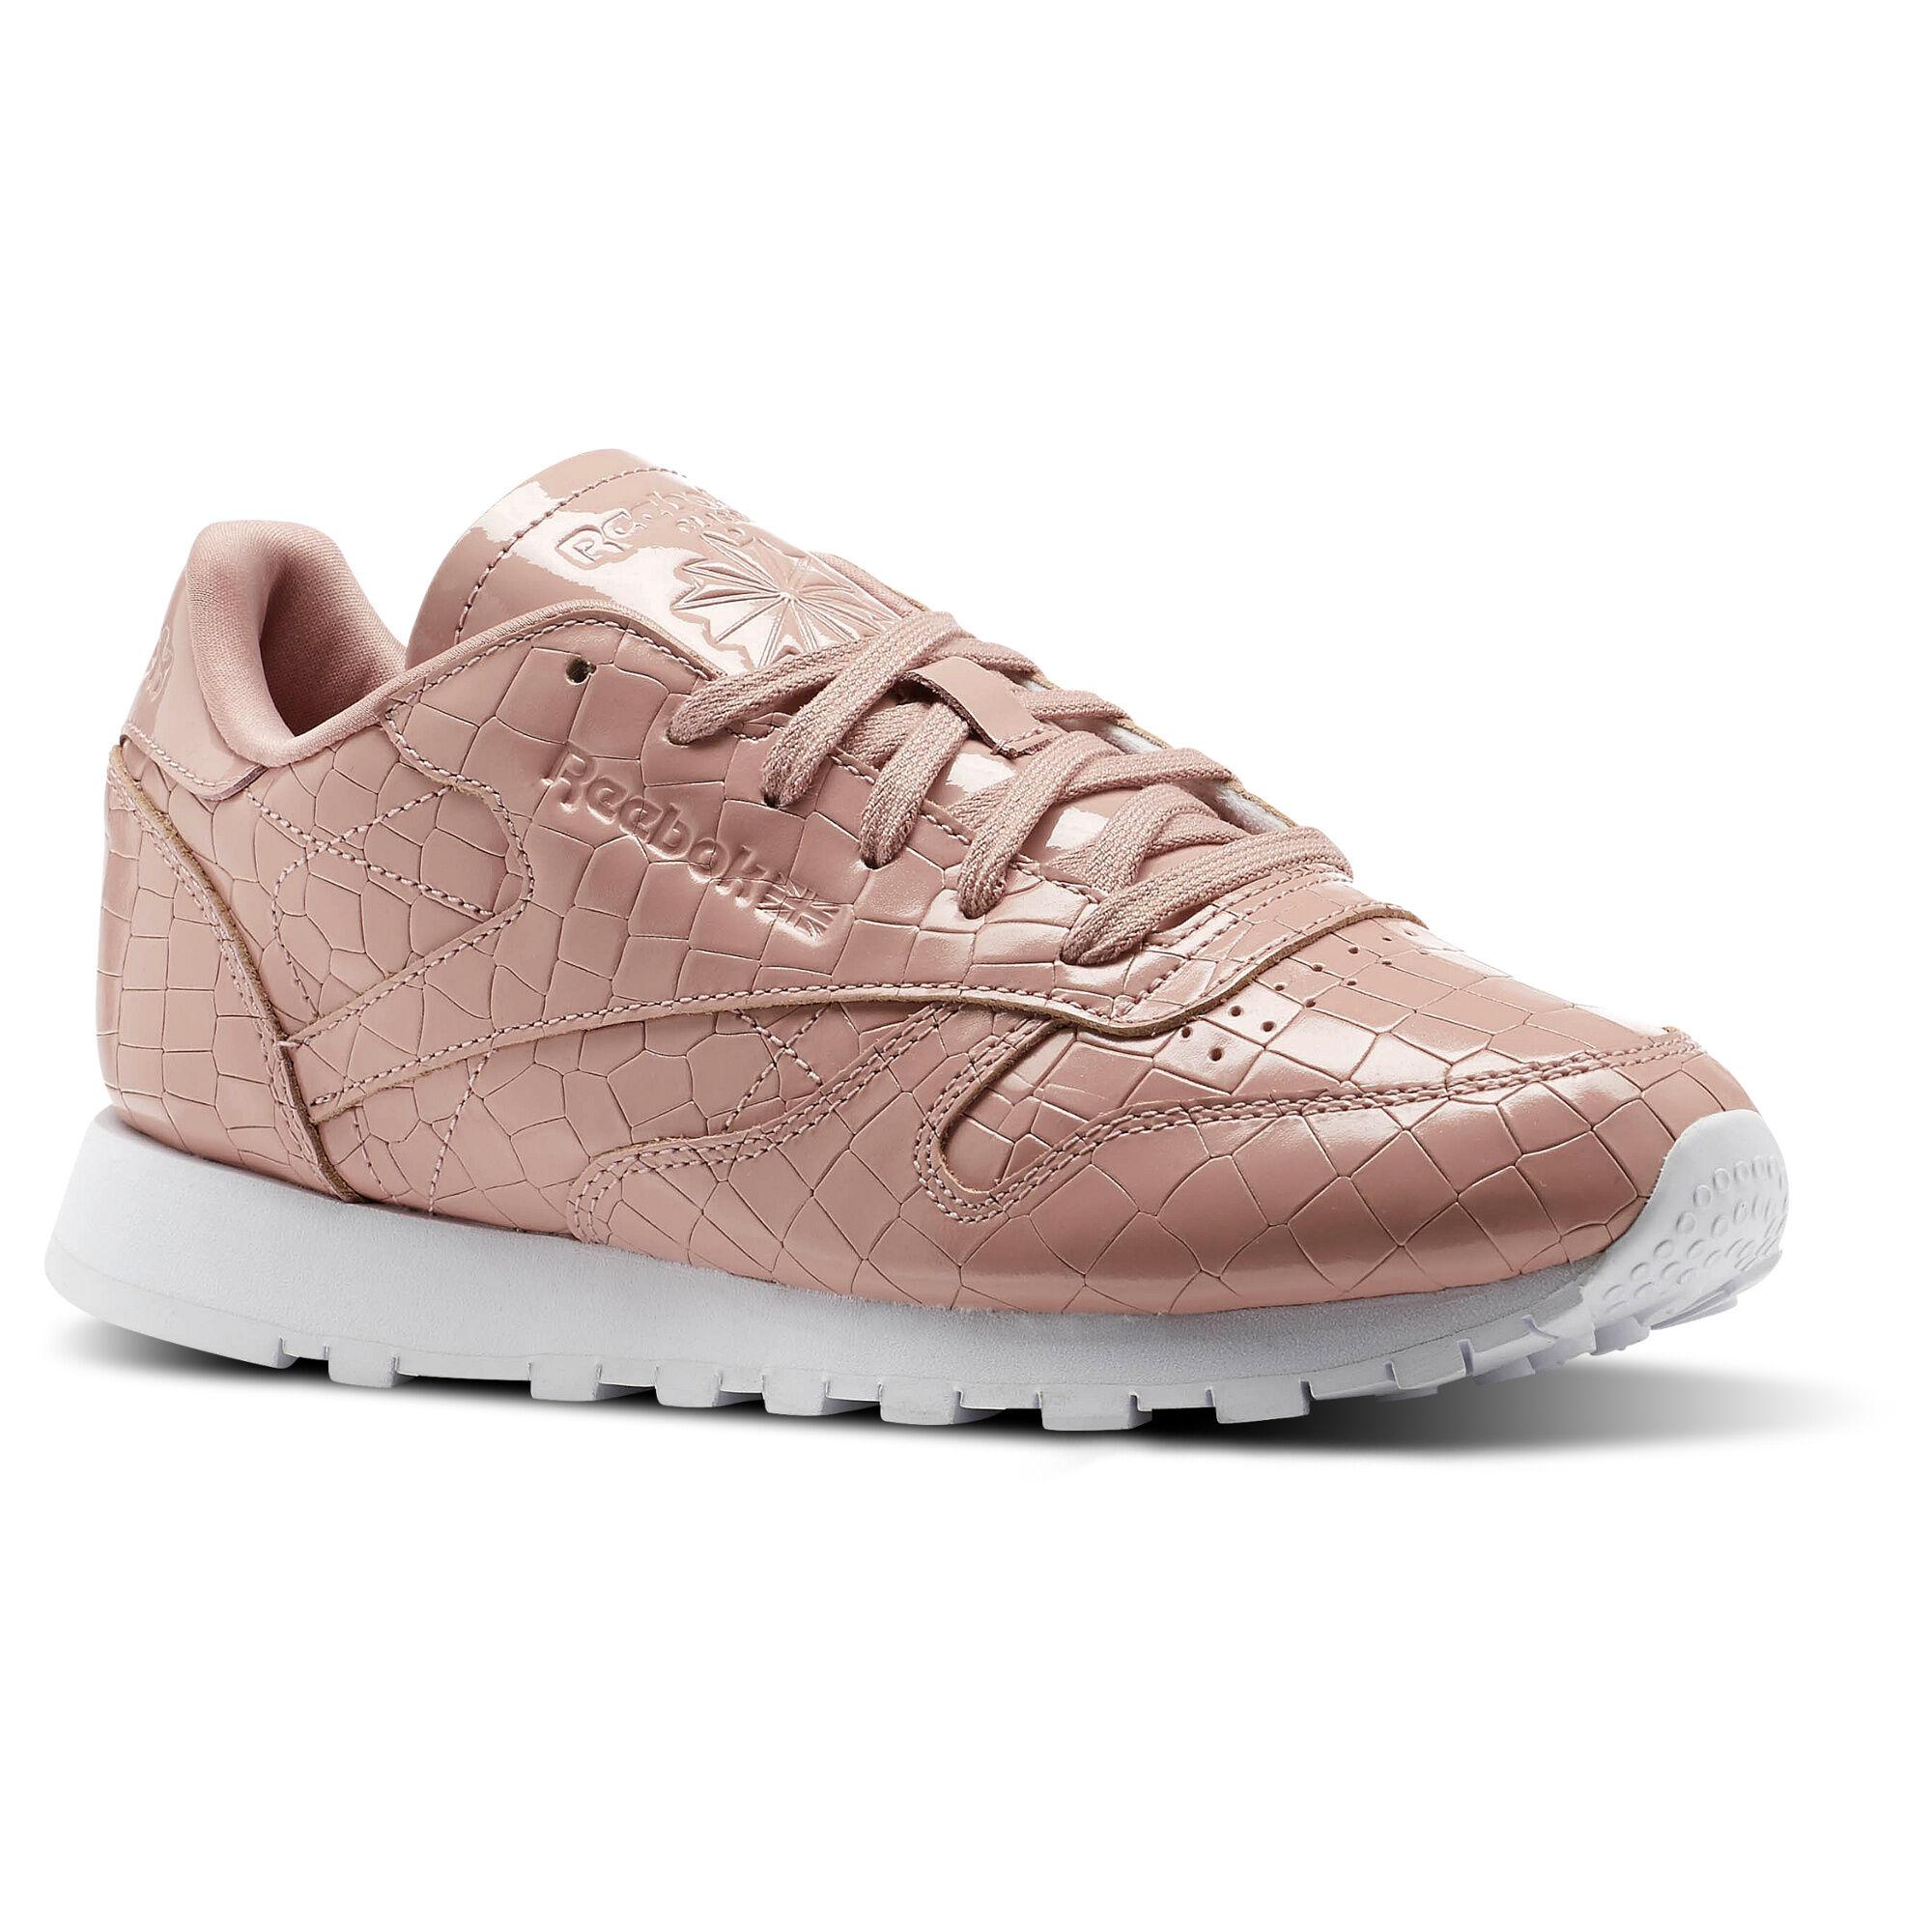 Damens Pink Schuhes Schuhes Schuhes   Reebok PT 90d3db